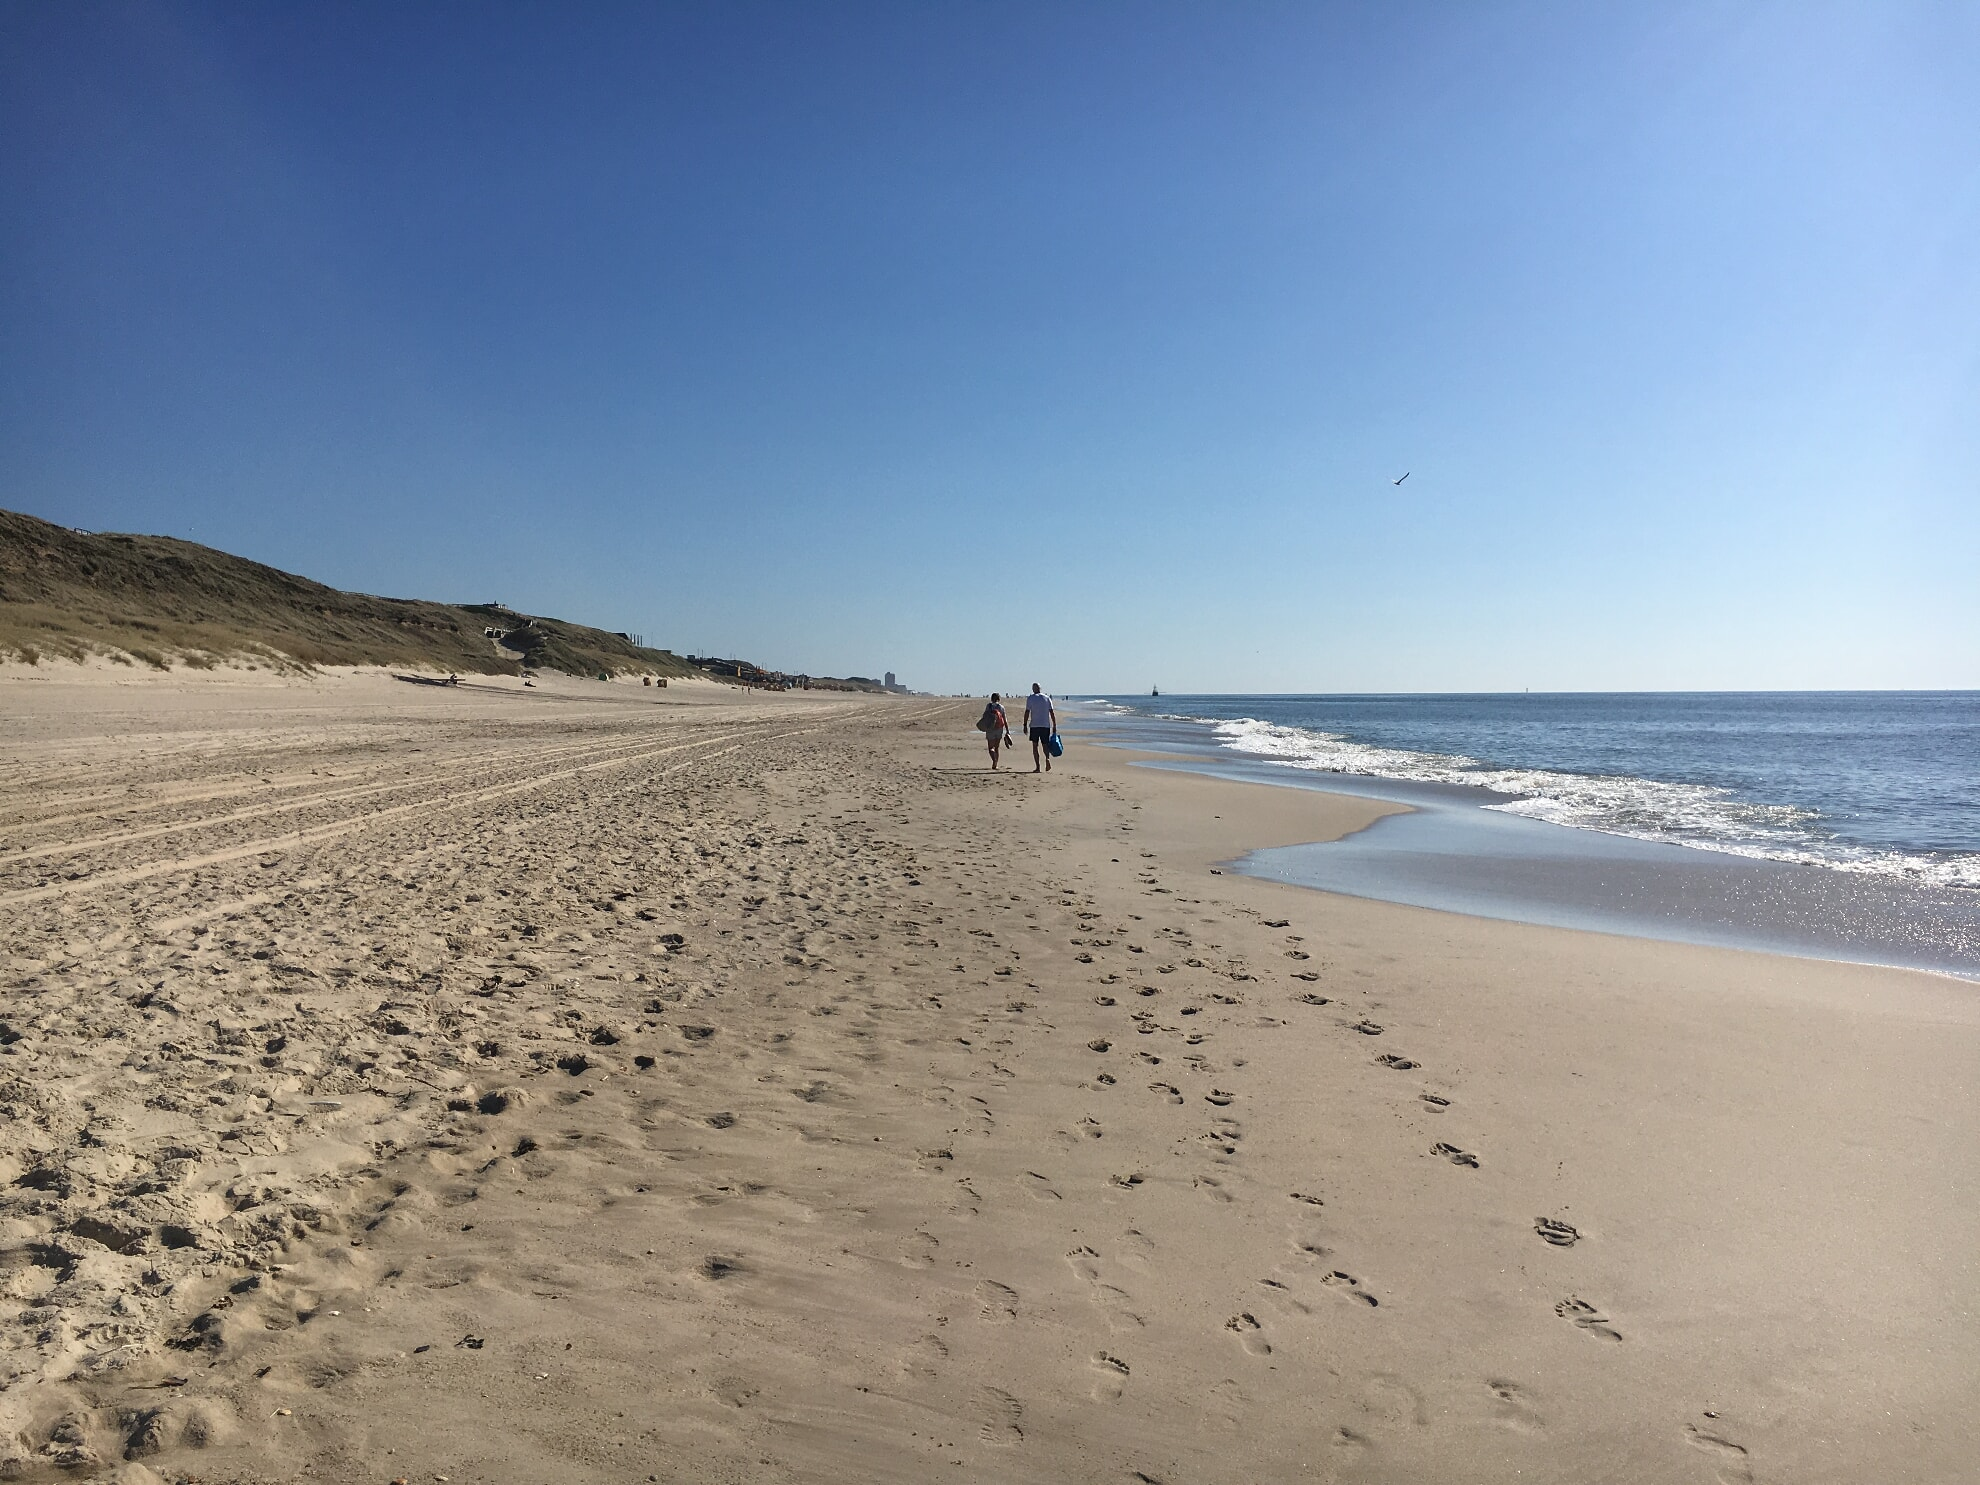 Rückweg am Strand